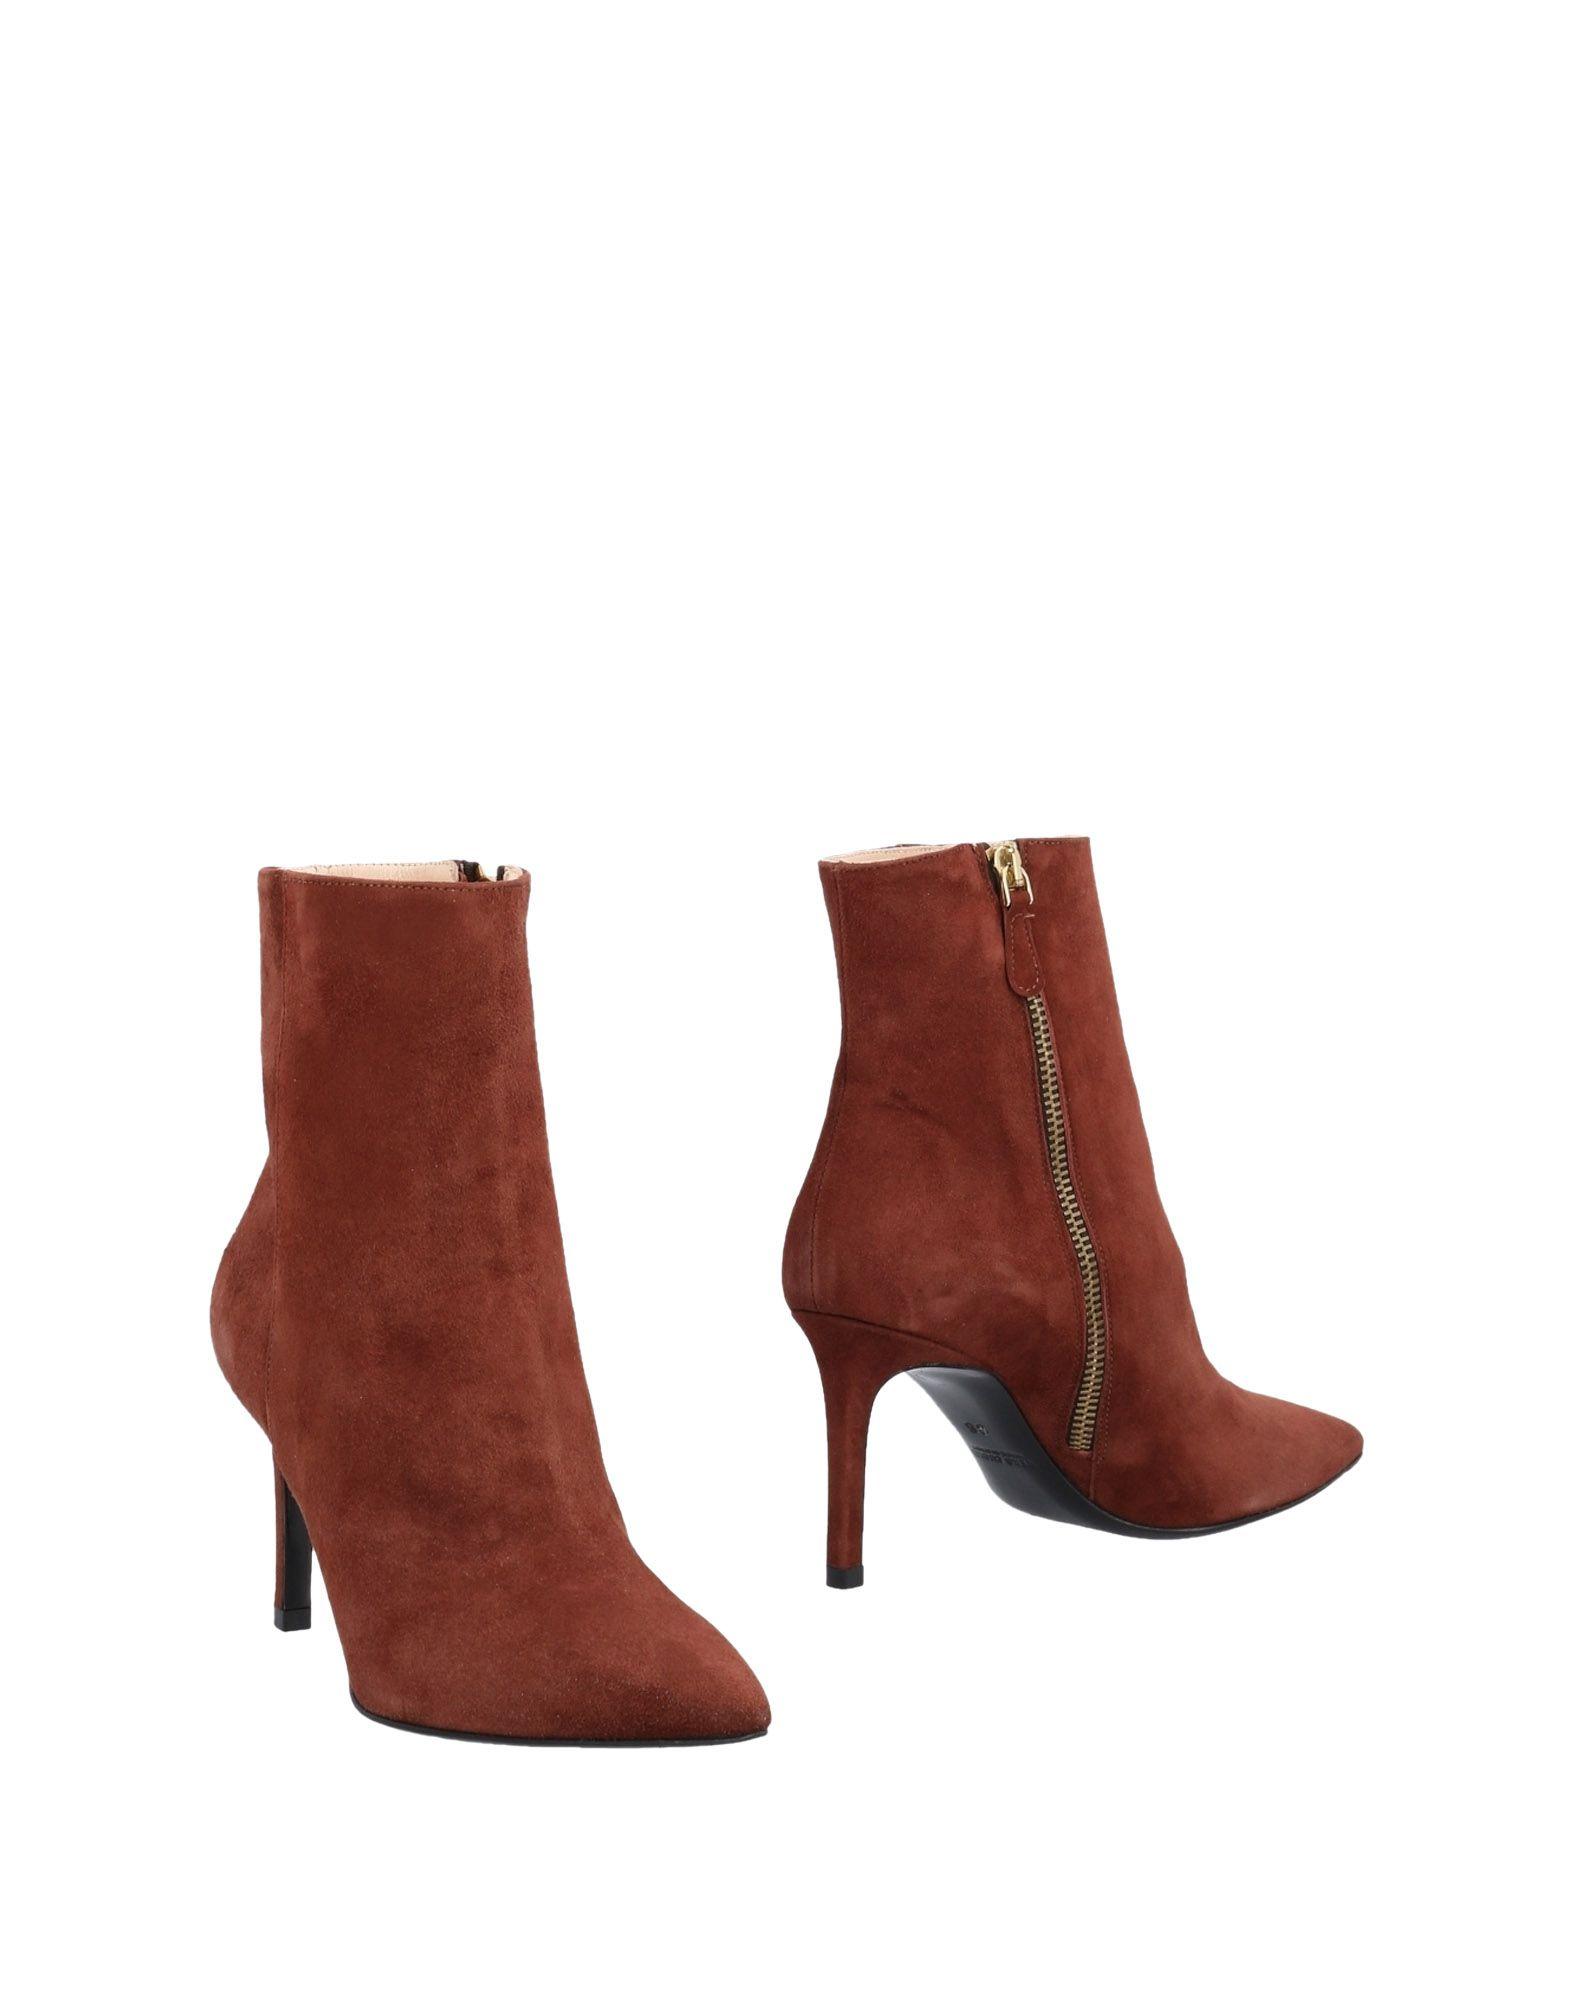 Stilvolle billige Schuhe Roberto Festa 11059881NV Stiefelette Damen  11059881NV Festa 2a81e7